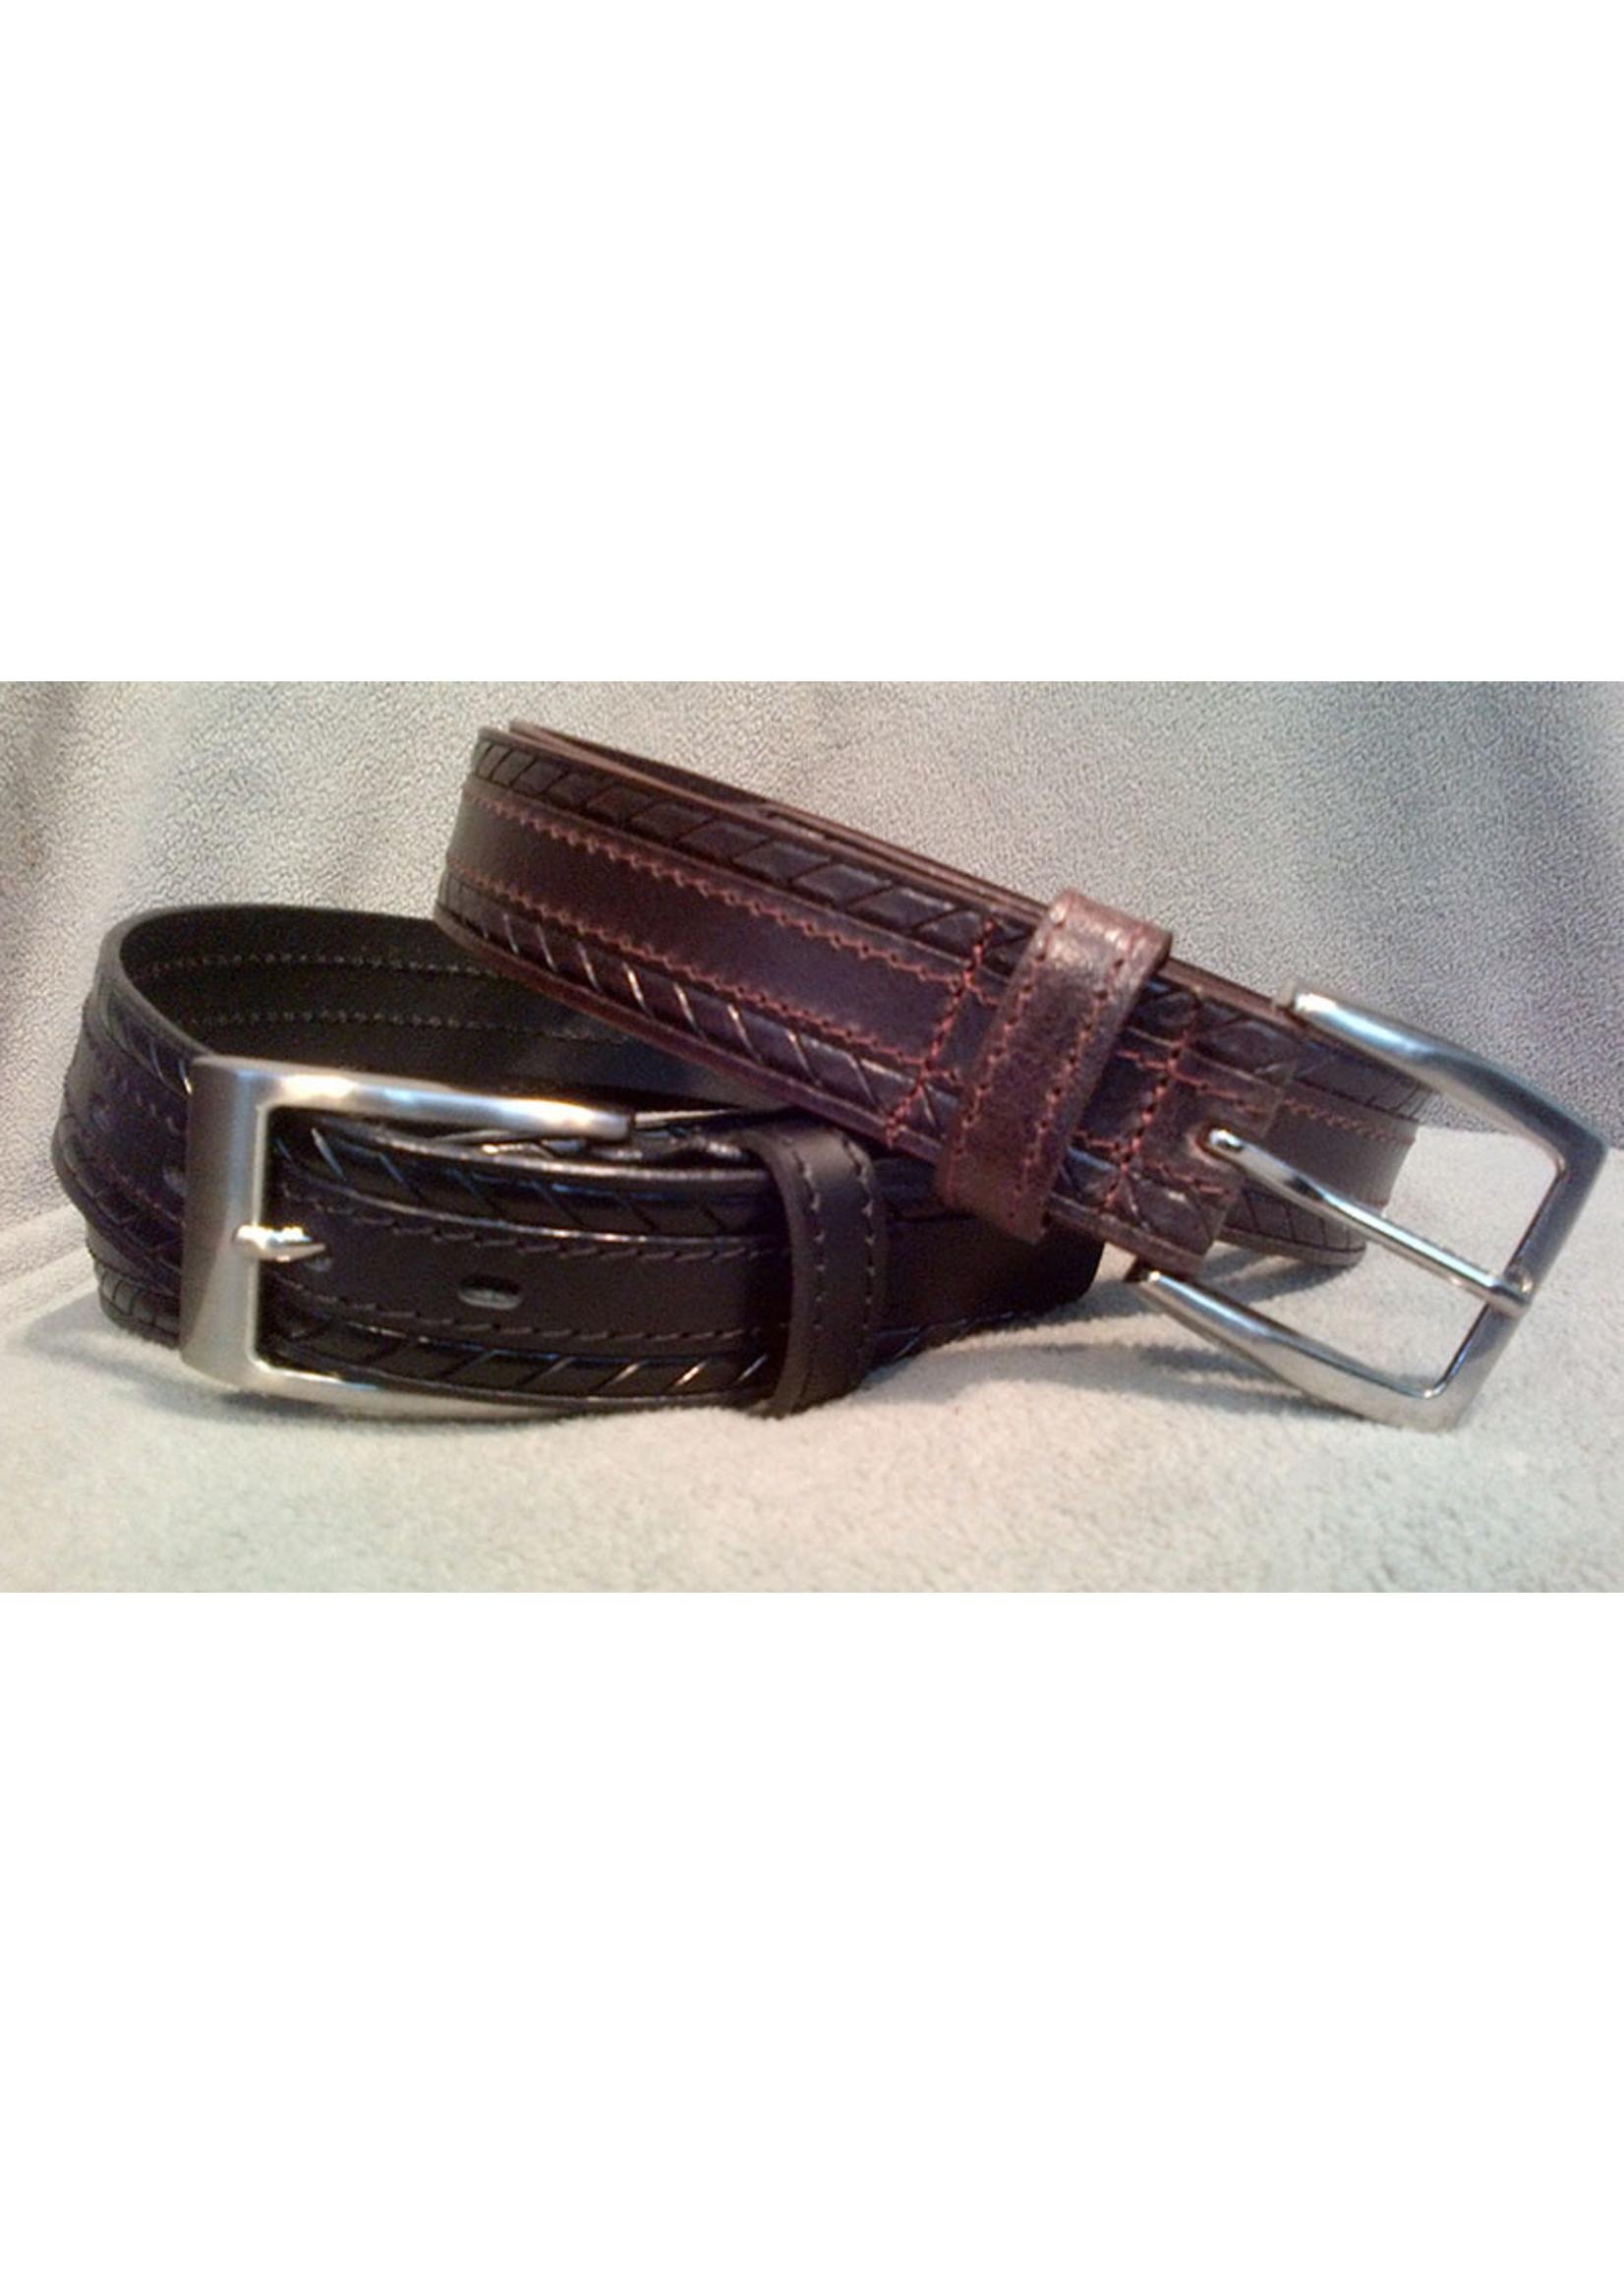 "Europa Dezines Europa Dezines ""Embossed & Stitched"" Genuine Leather Belt"